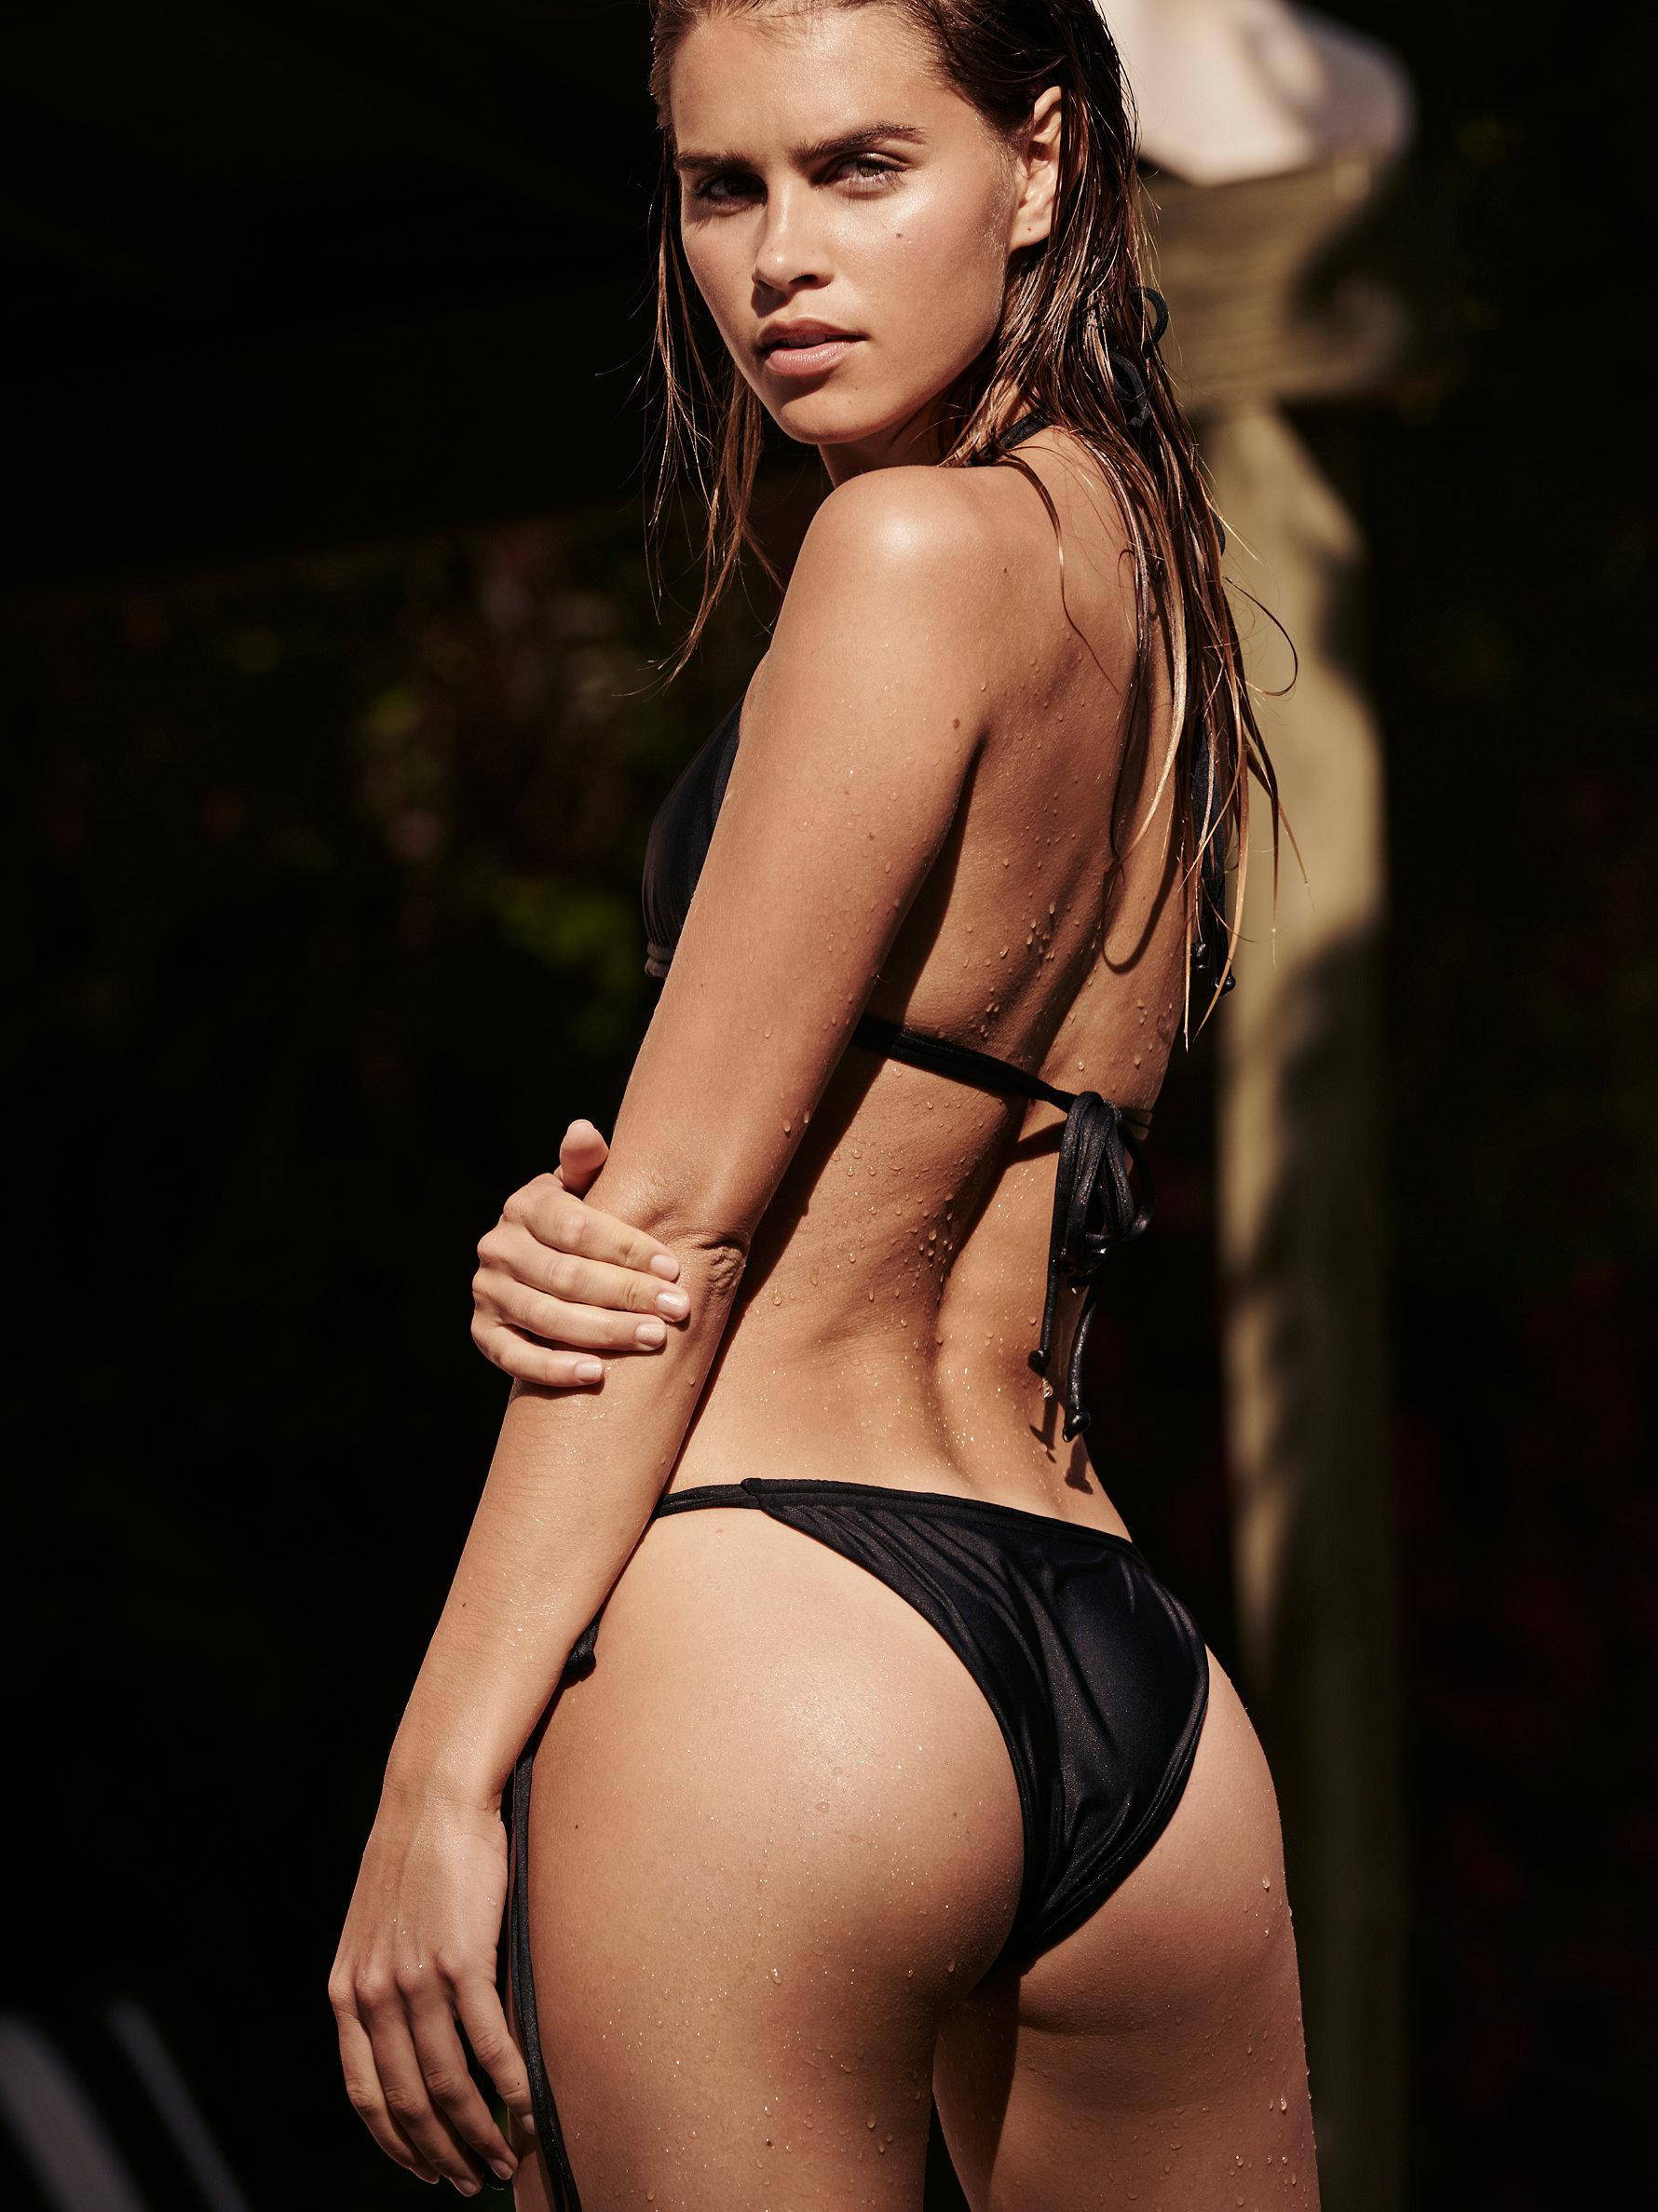 bikini-model-pics-free-nice